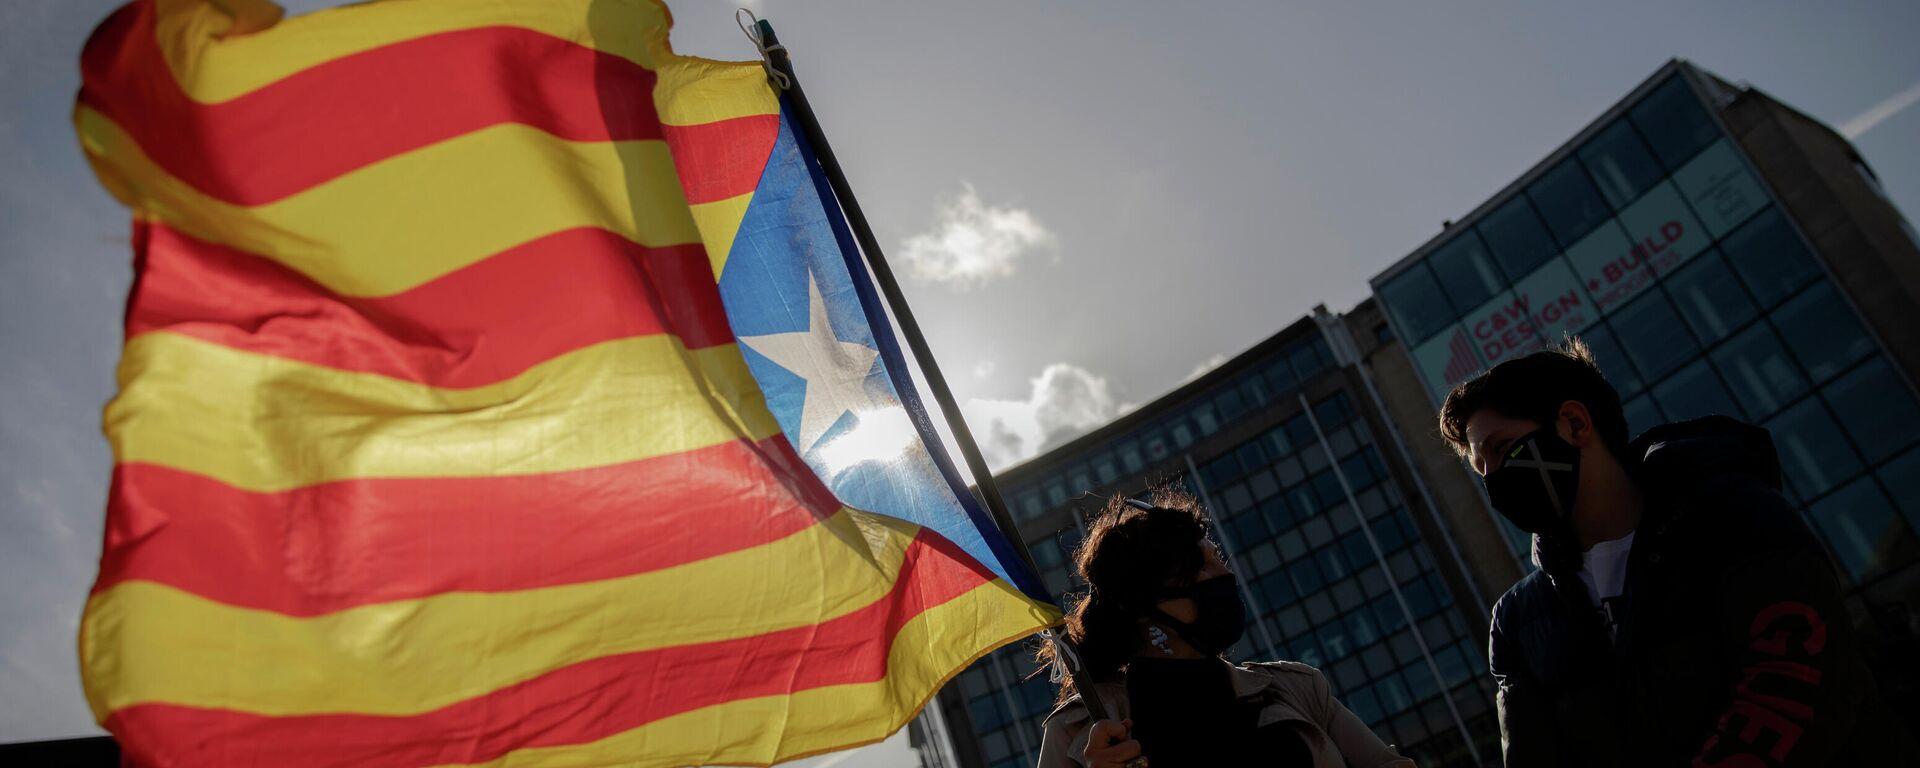 Katalanische Flagge (Archiv) - SNA, 1920, 17.05.2021